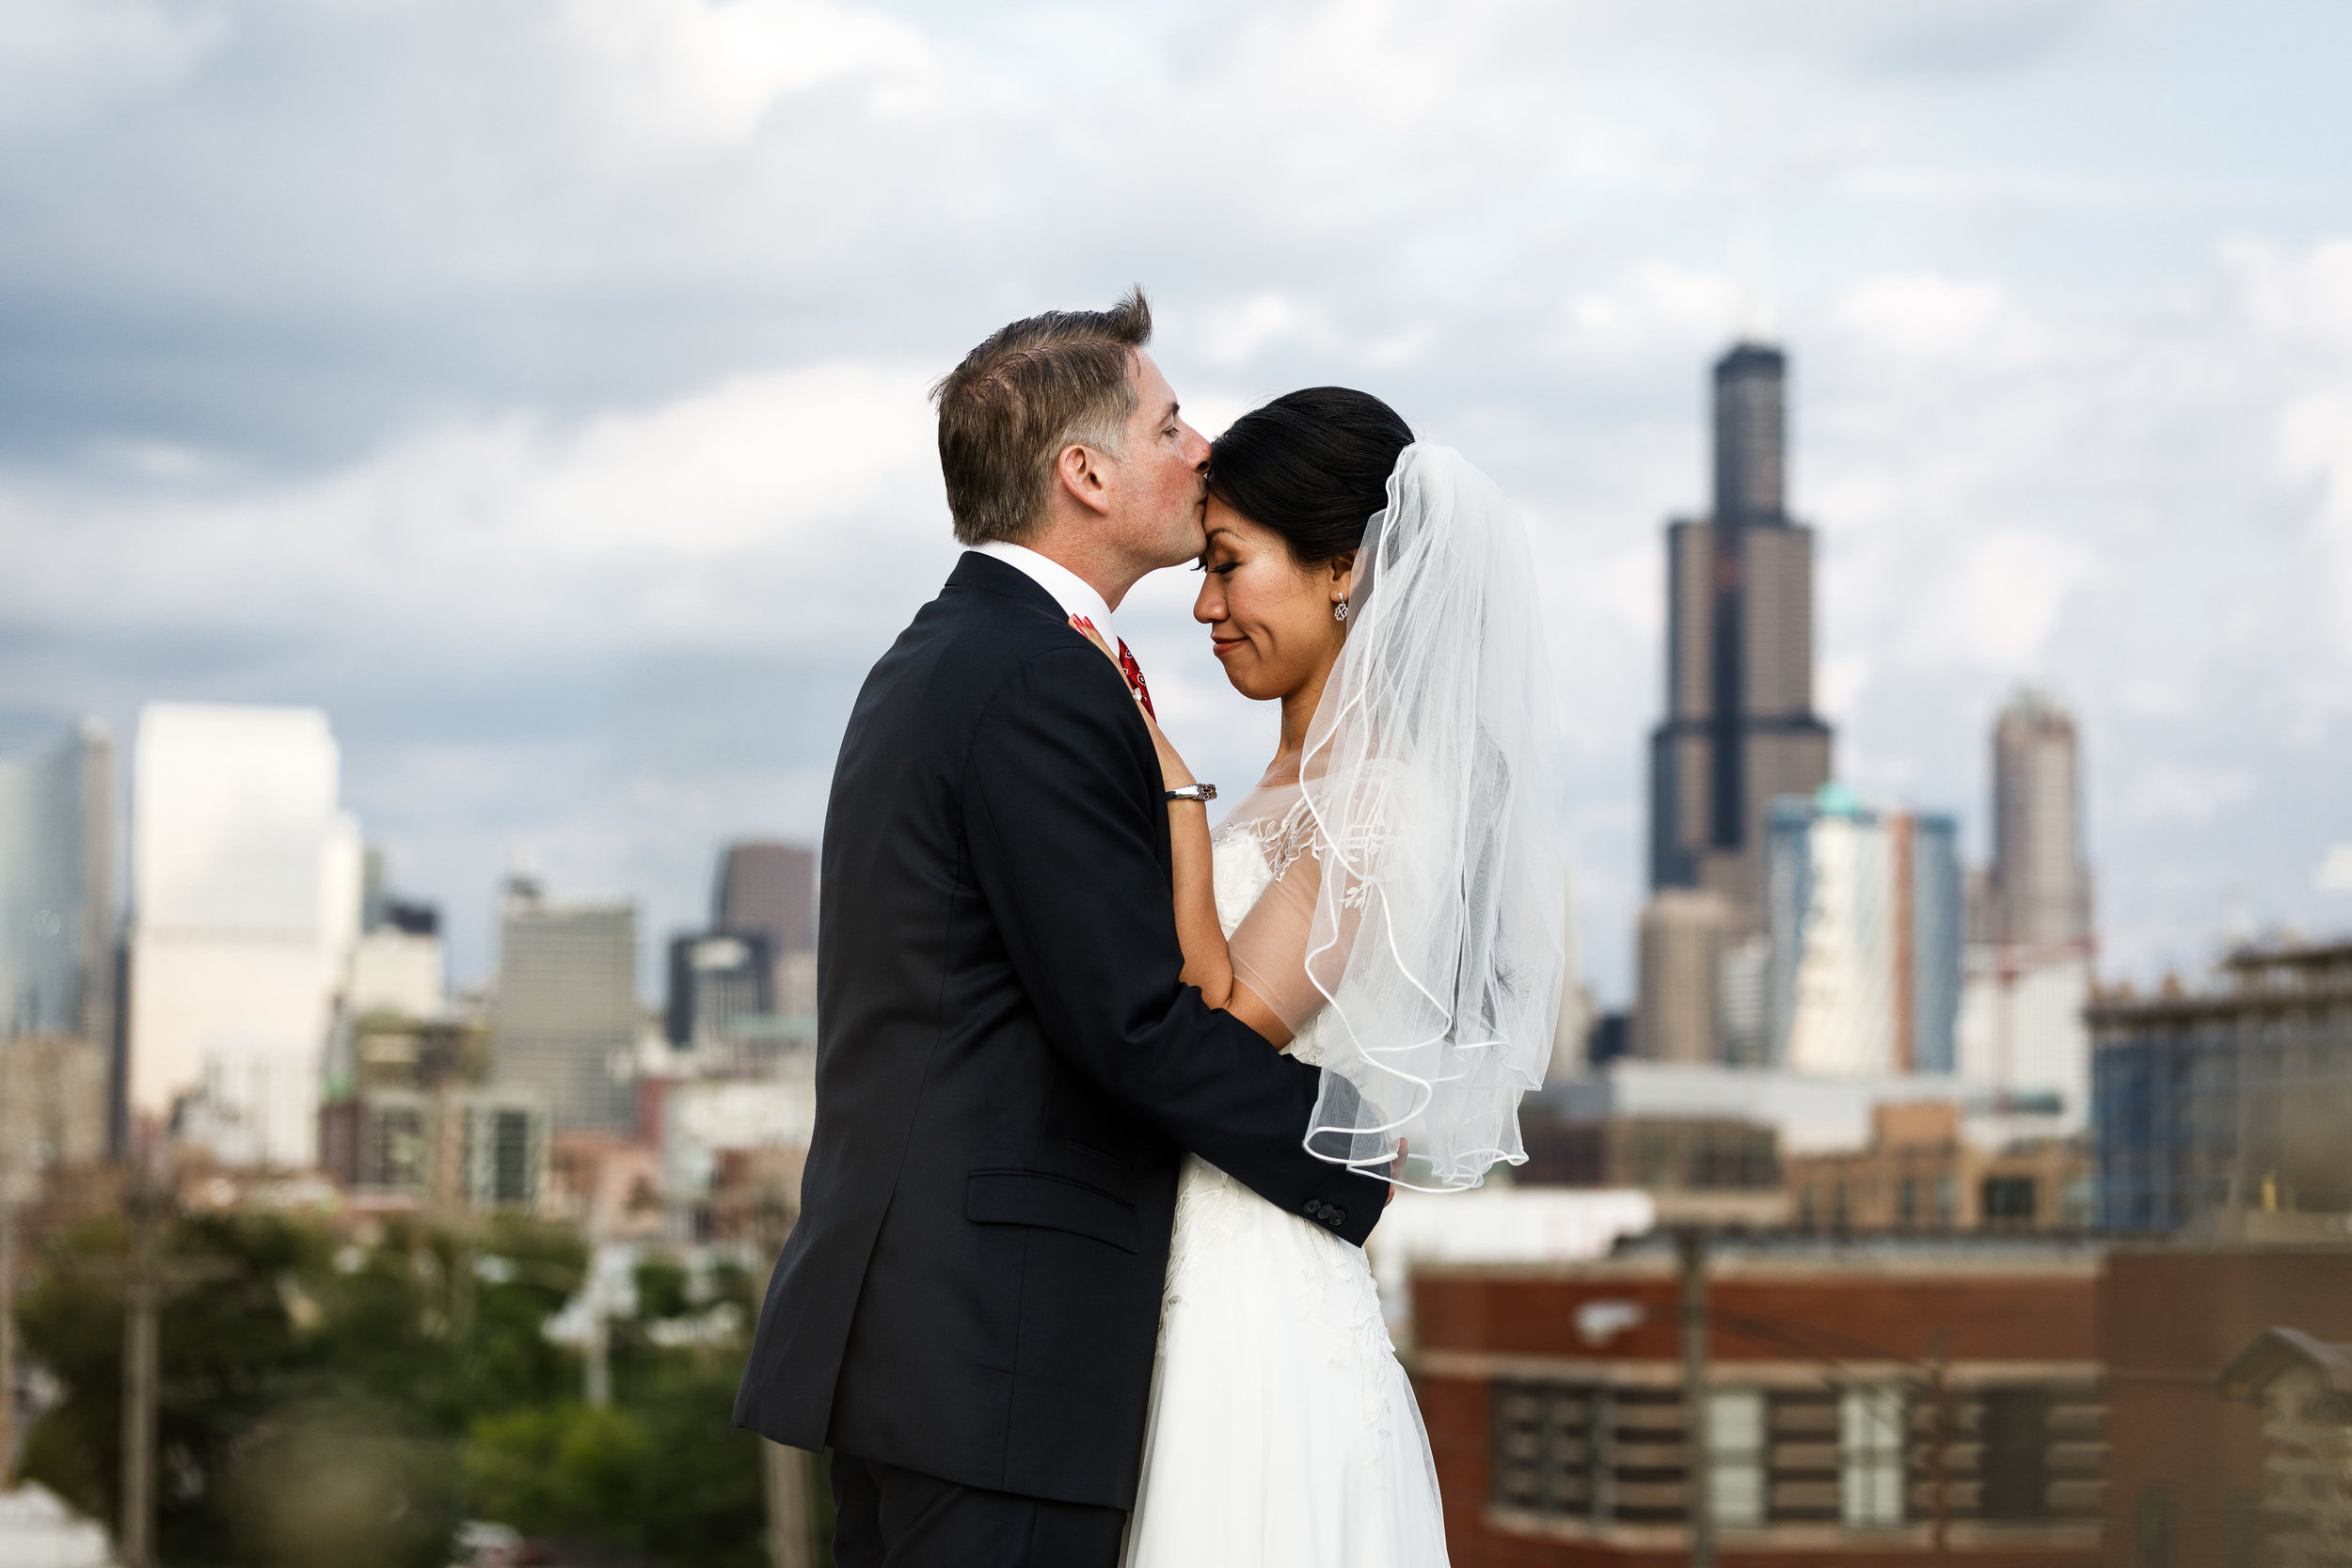 bc12f12850 Weddings — Jamie & Eric Photography | Wedding, Engagement, Elopement ...